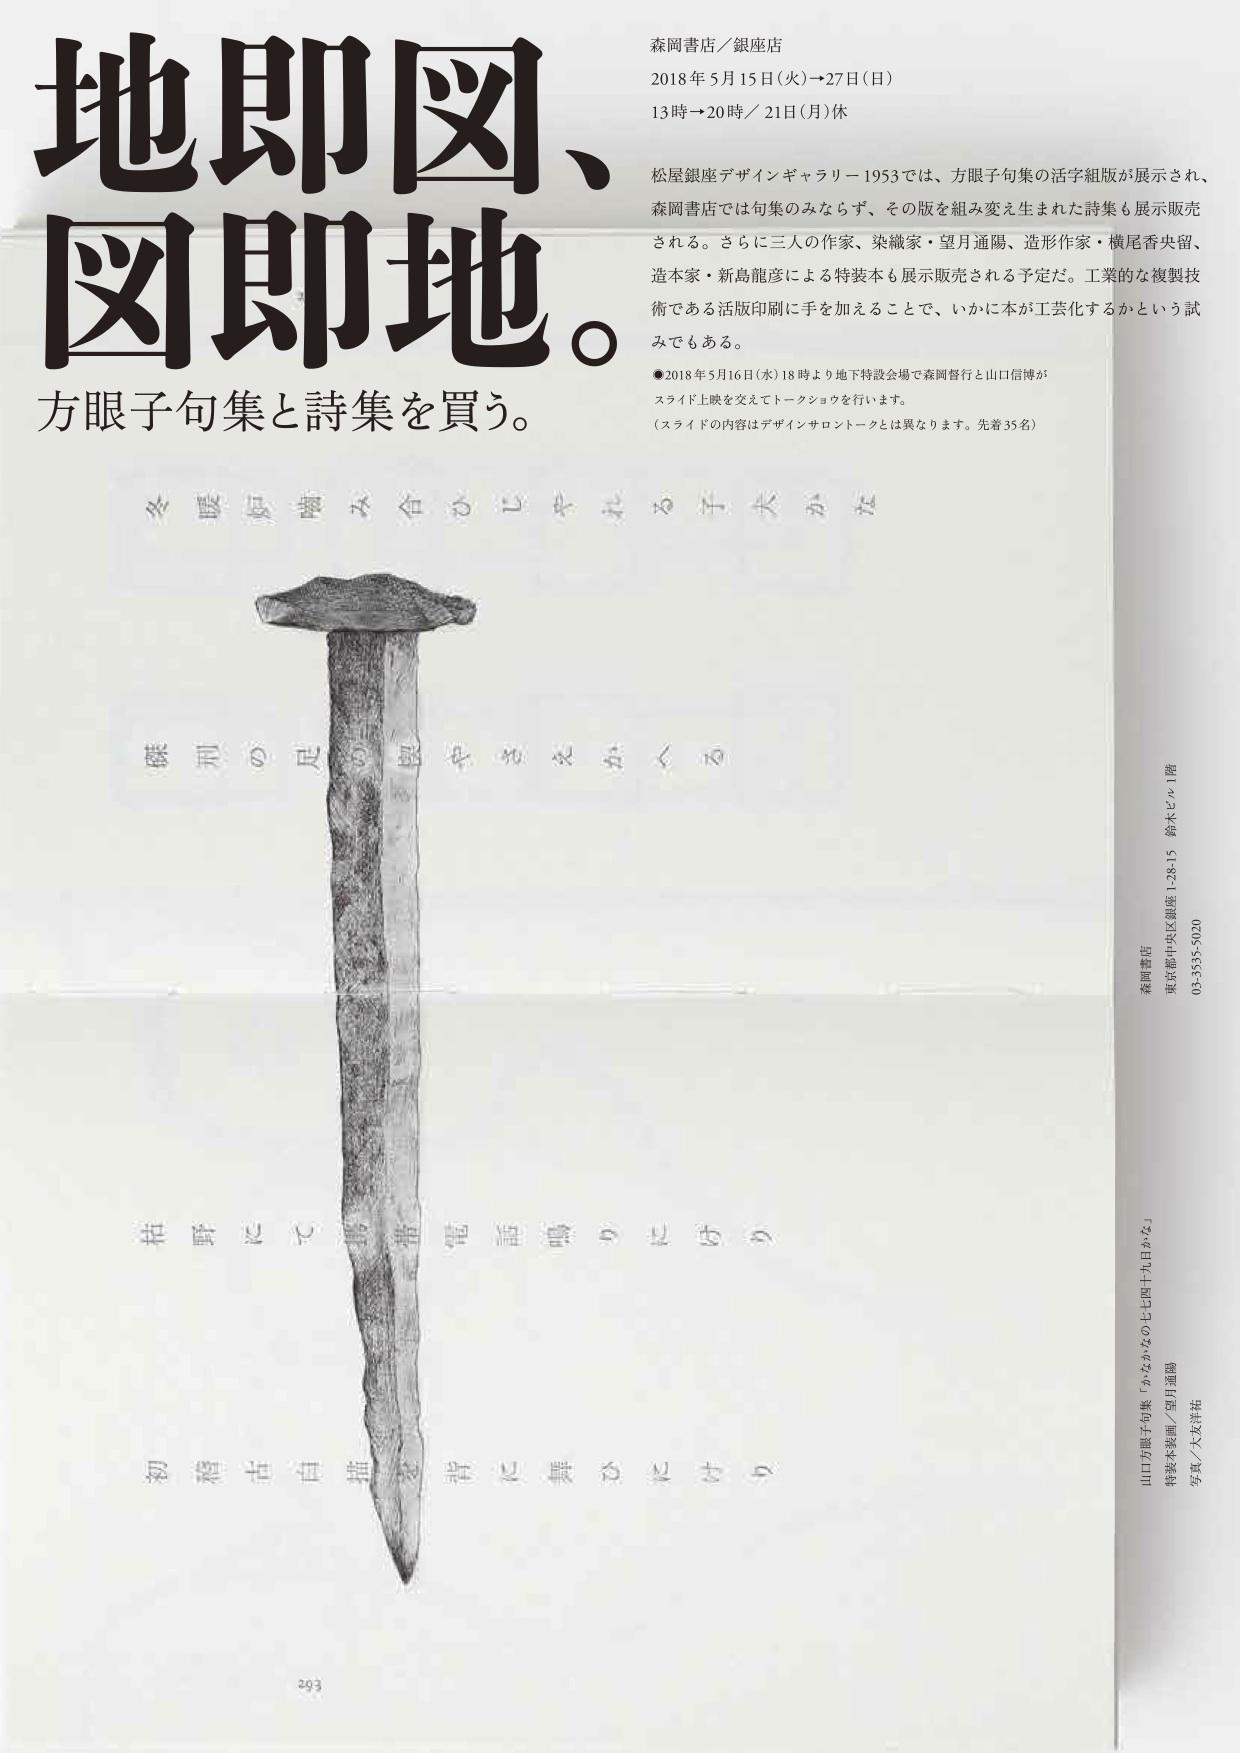 http://origata.com/activity/hoganshi_flyer2.jpg